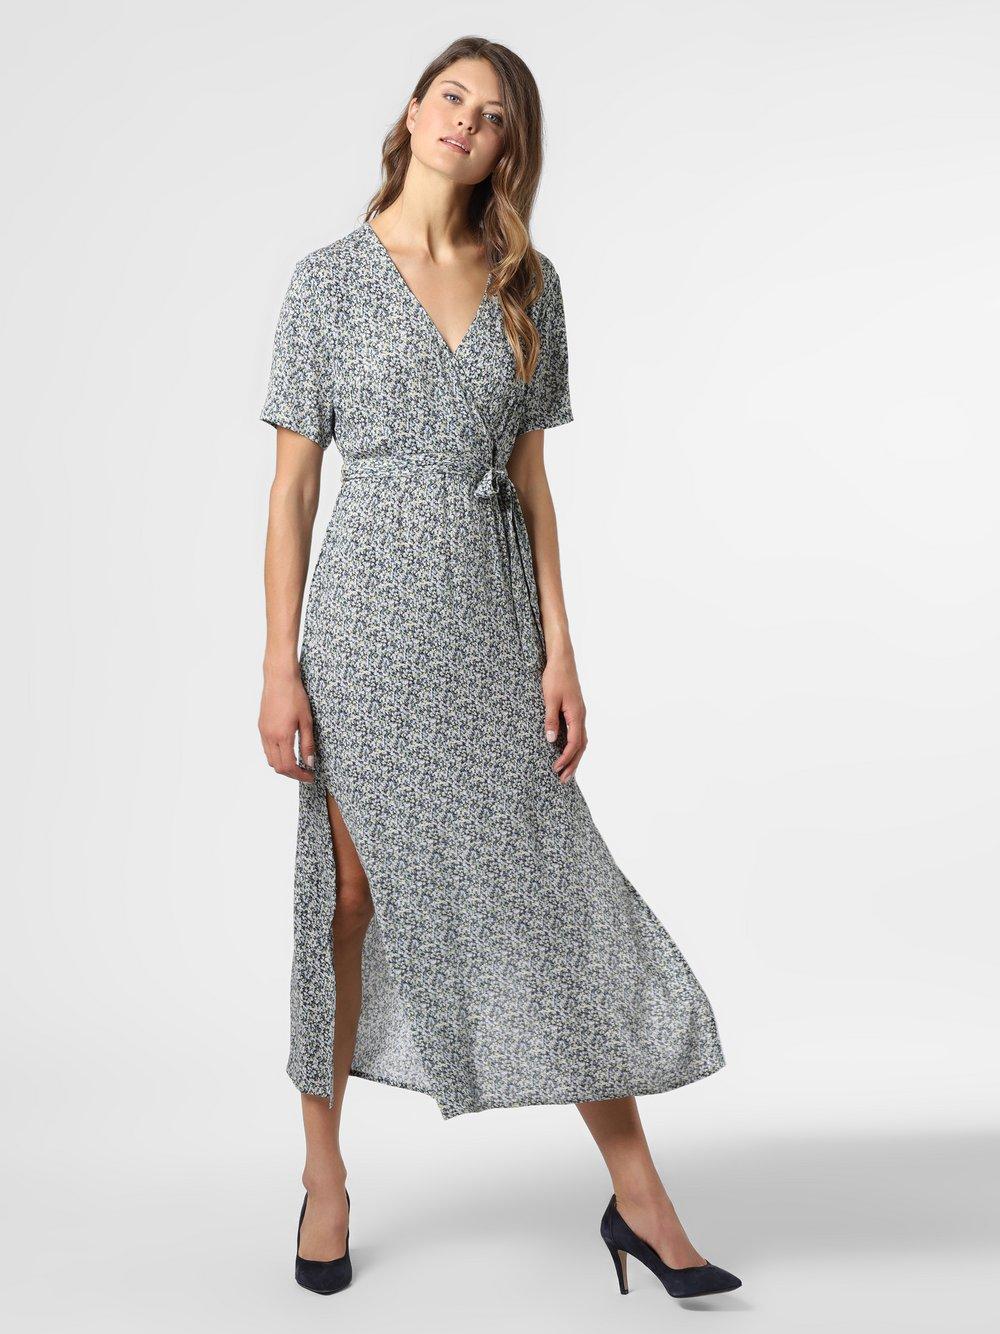 mbyM – Sukienka damska – Semira, niebieski Van Graaf 484590-0001-09900